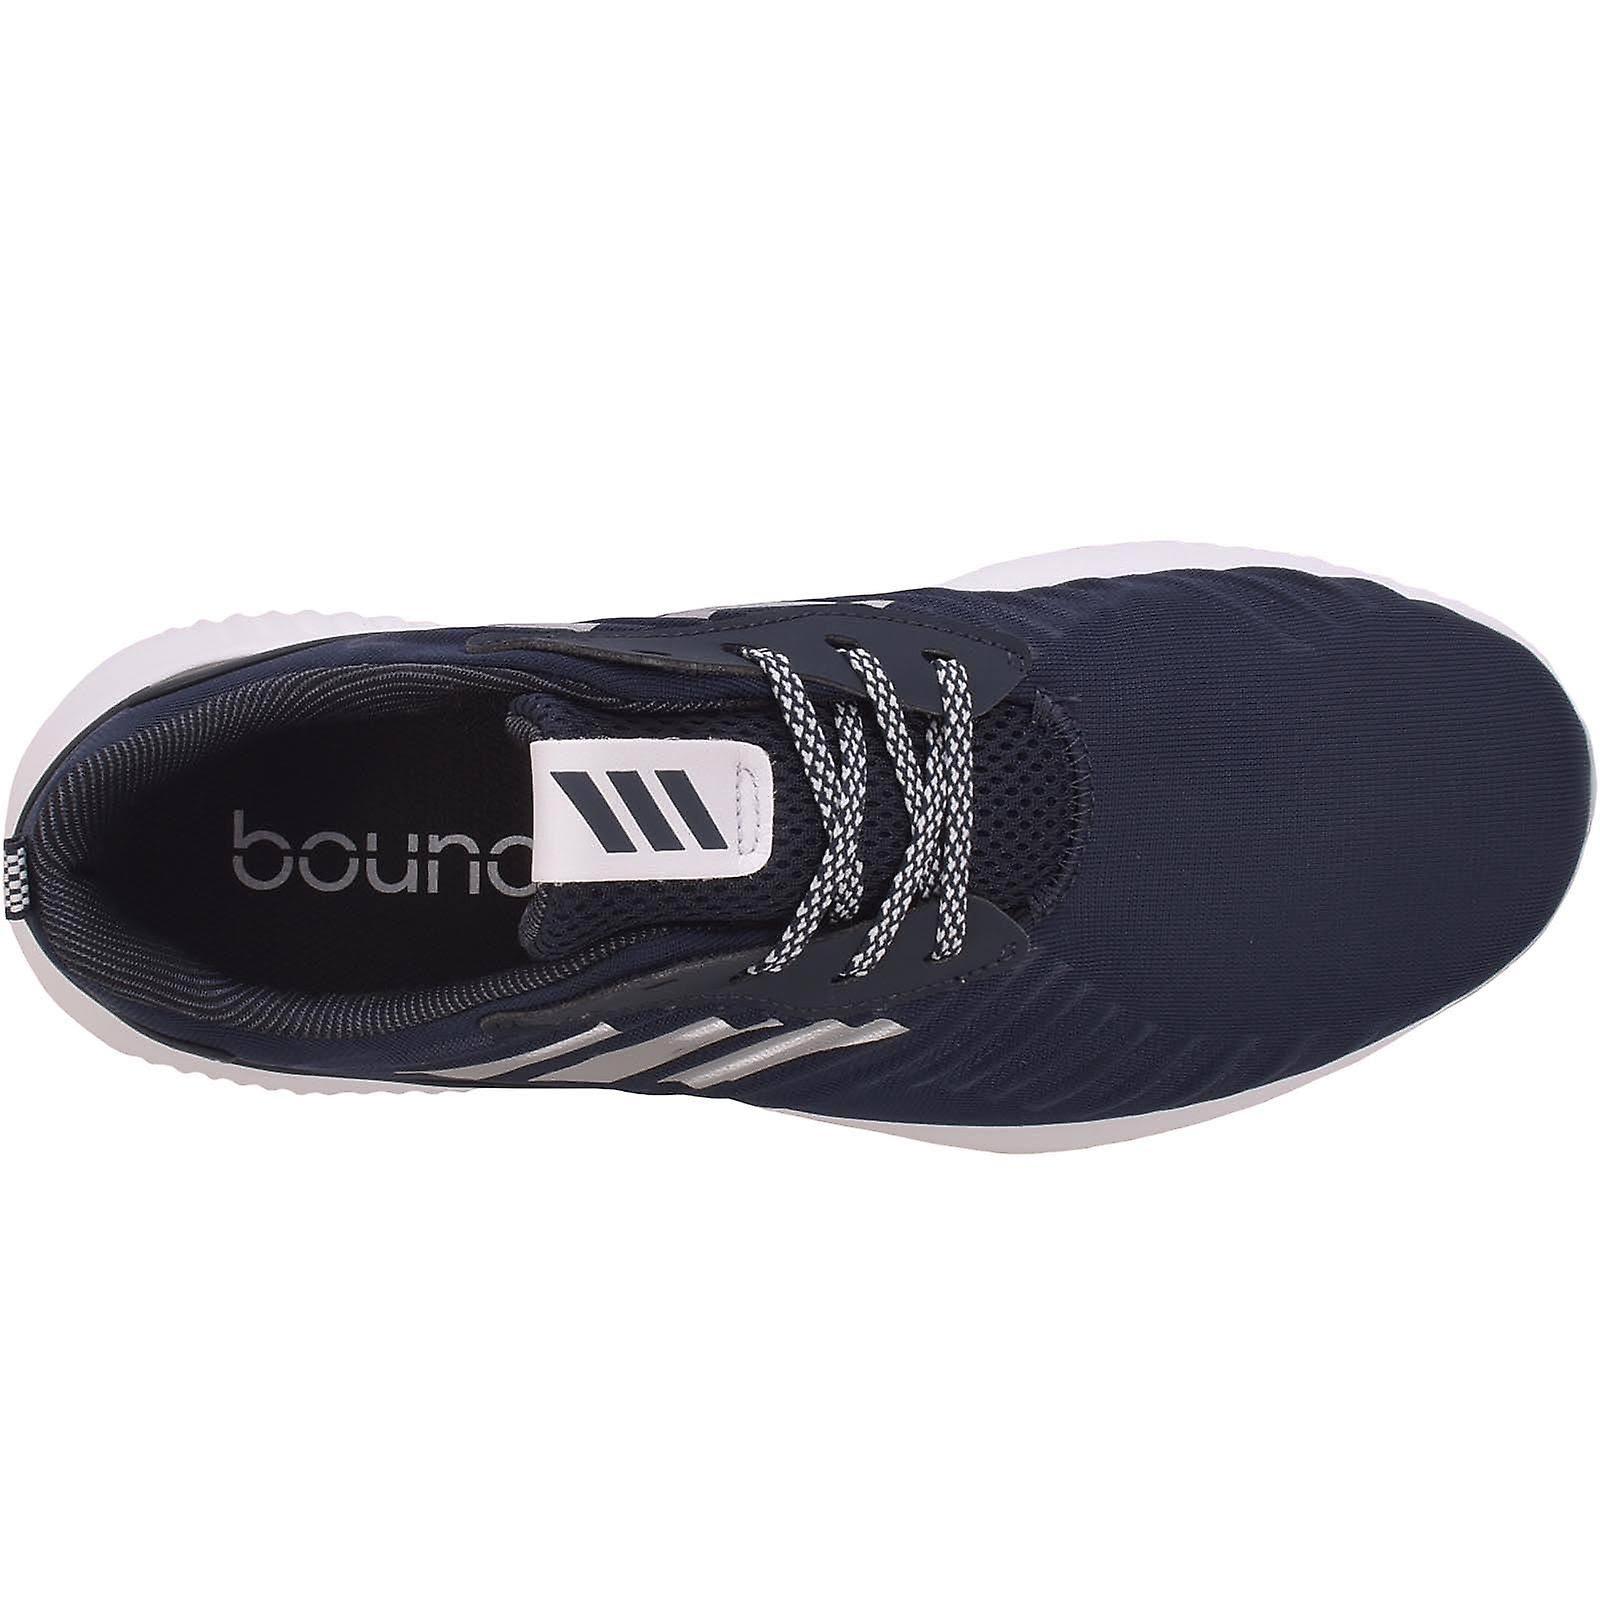 Adidas Performance Mens Alphabounce RC Pce Up Running shoes Trainers - Marina Blu marino 8 UK  EhLDRD